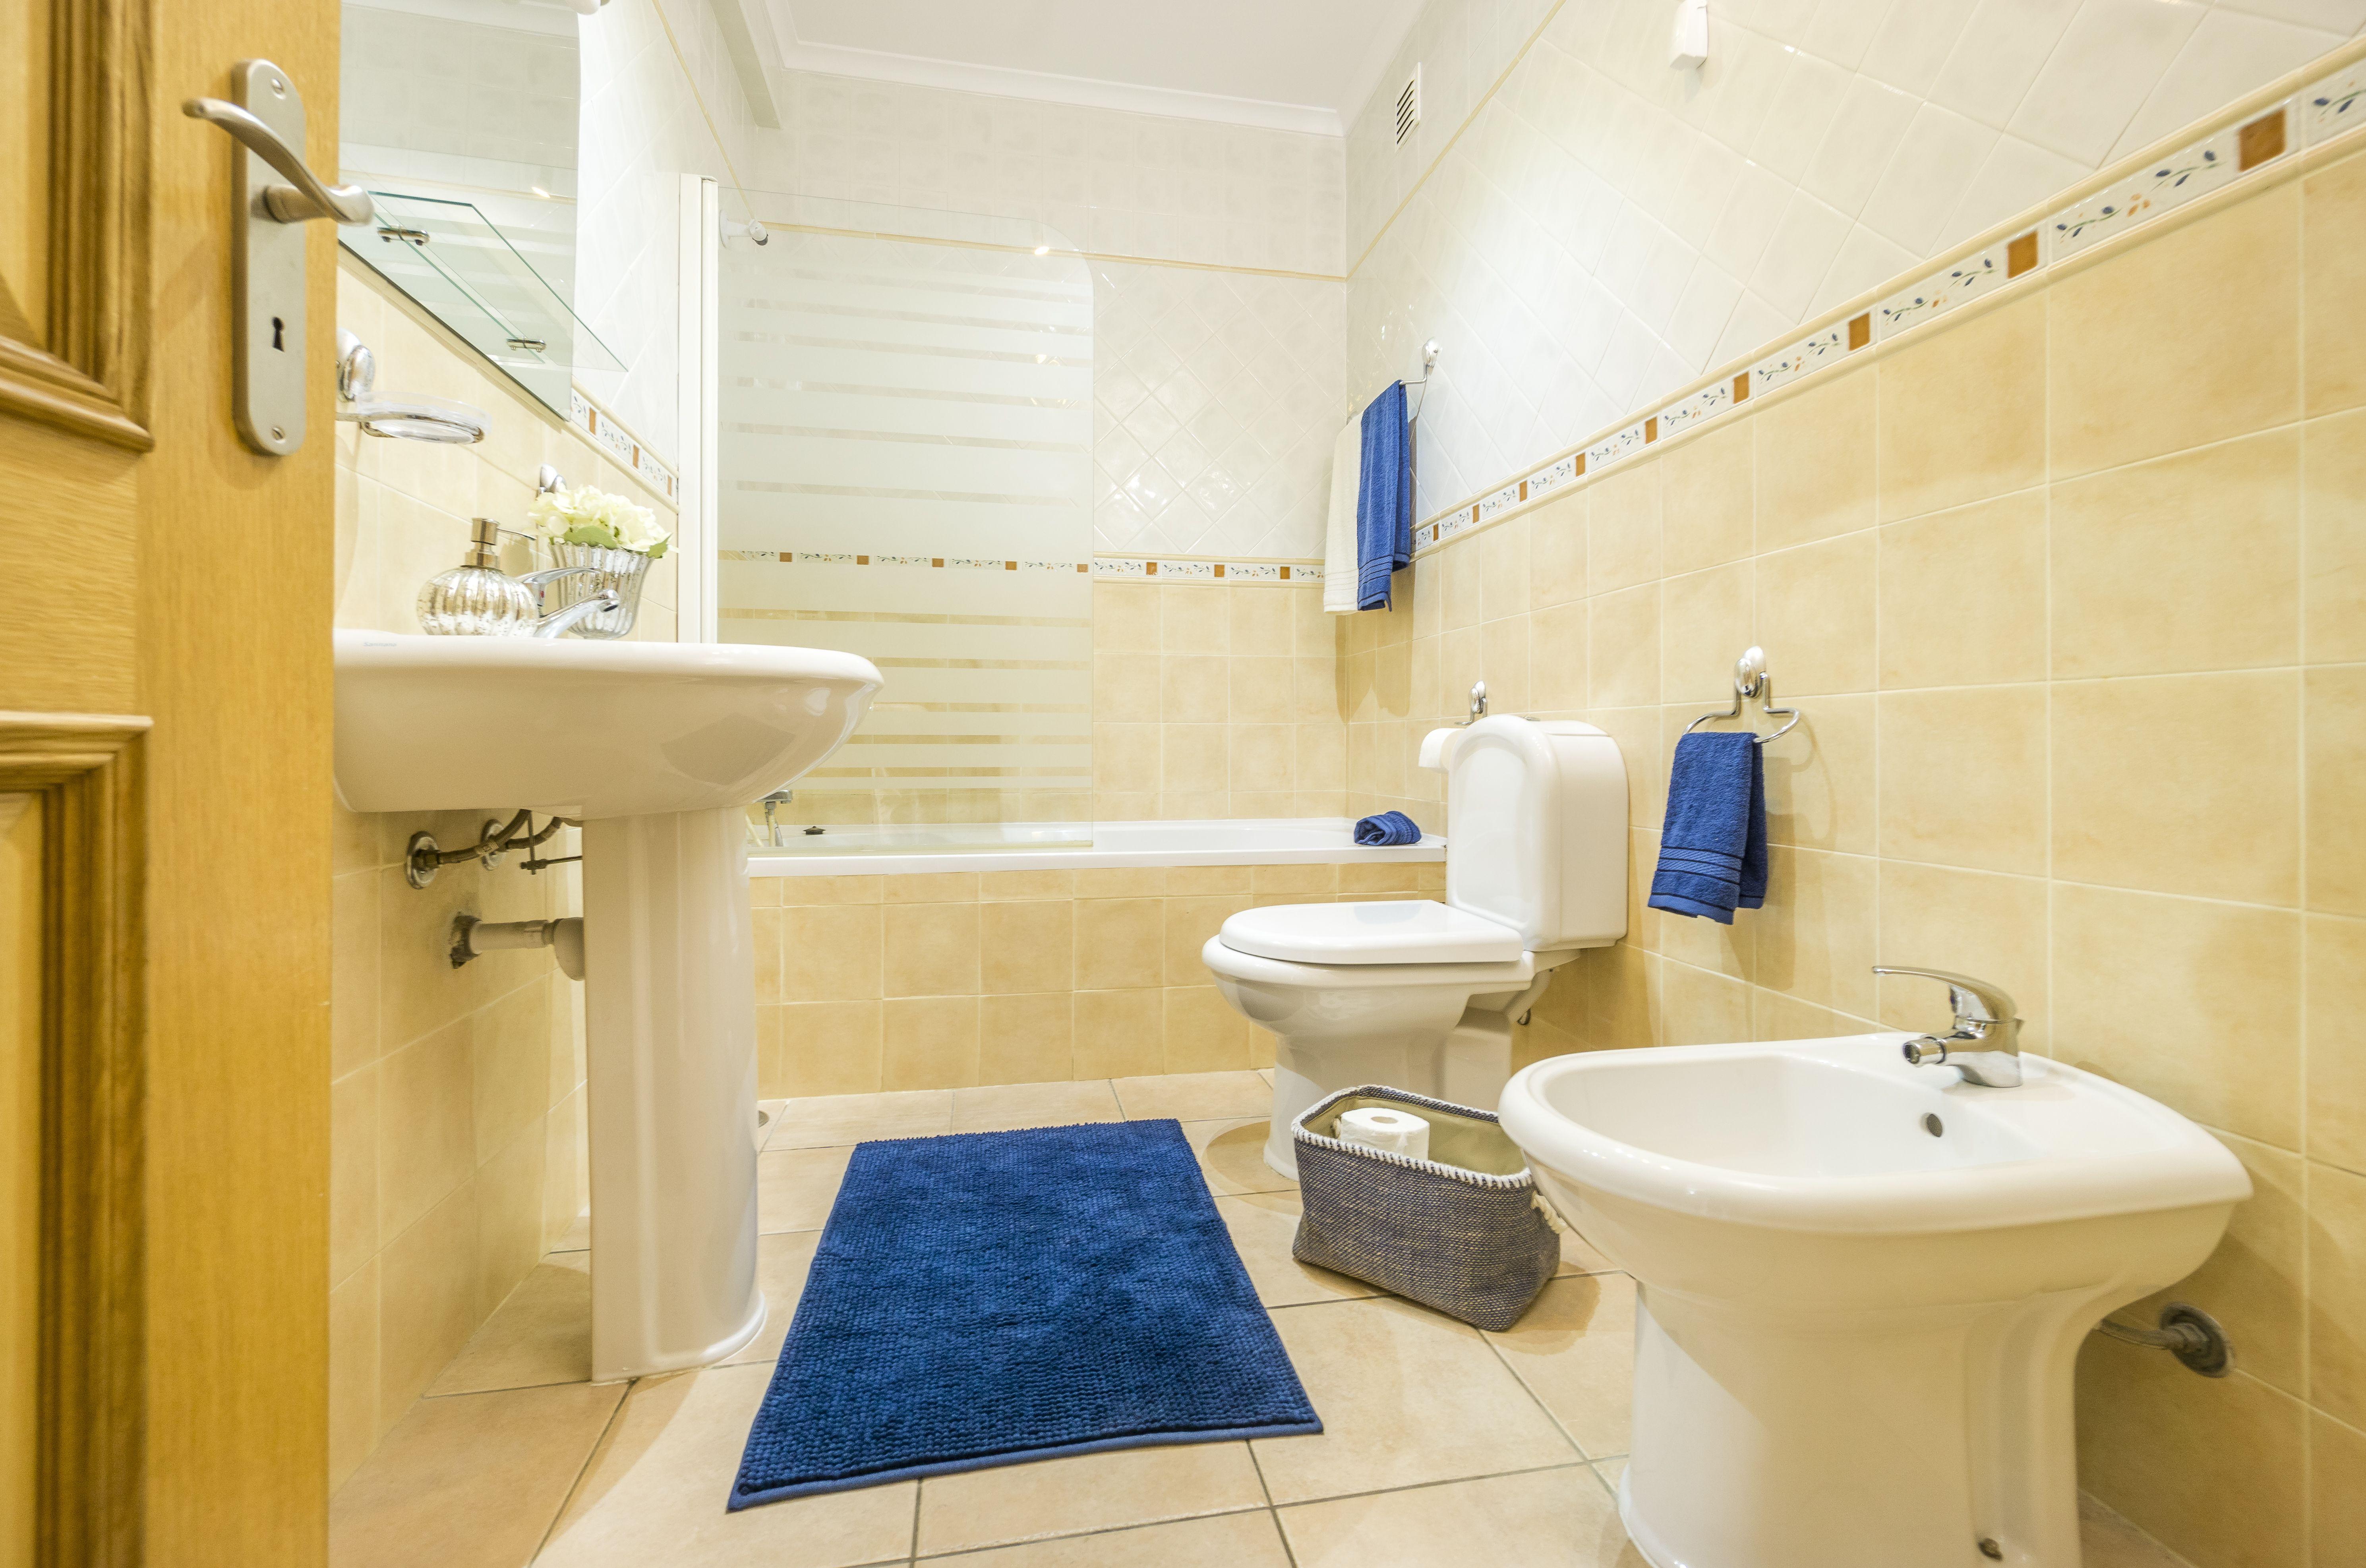 Venta de mobiliario para baño